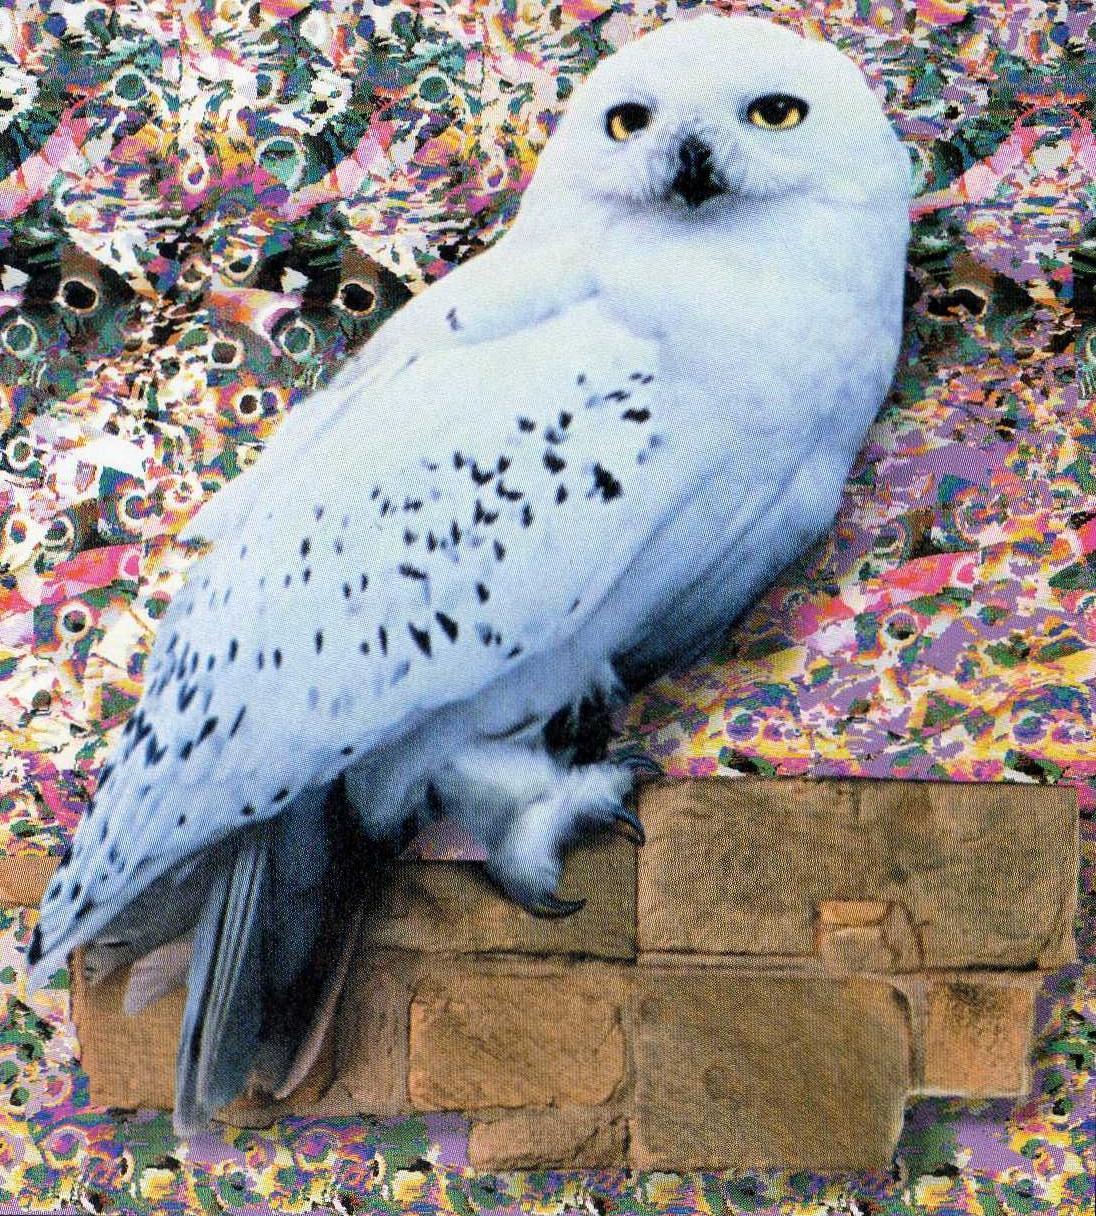 Bestand:Hedwig.jpg